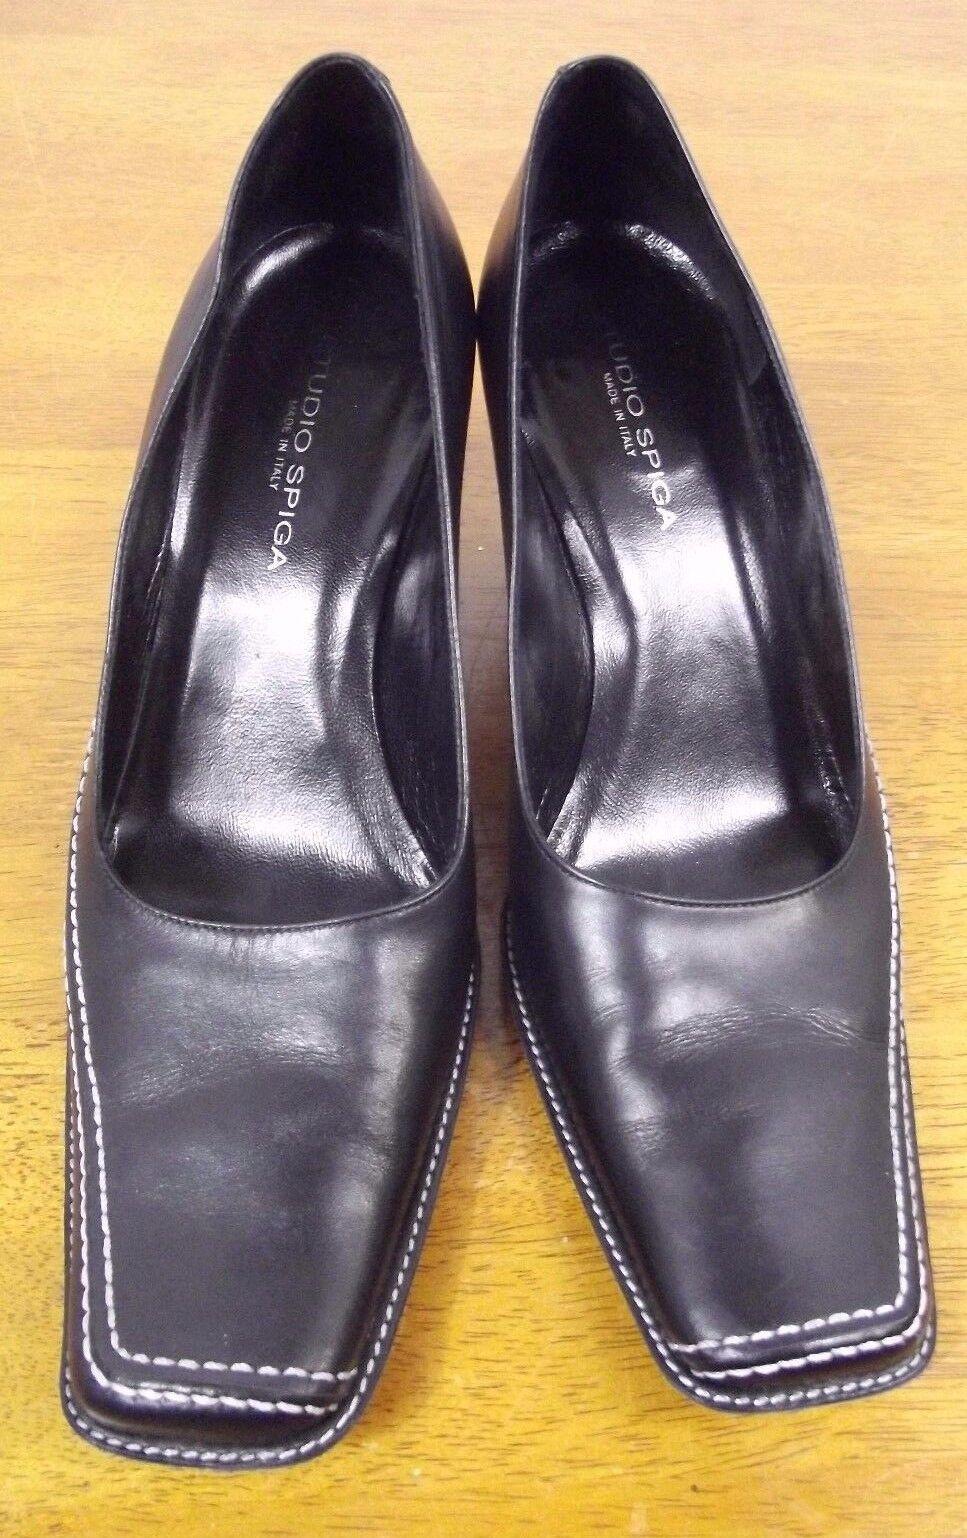 Studio Spiga Womens shoes Size 6 M Black Leather Heels Pumps